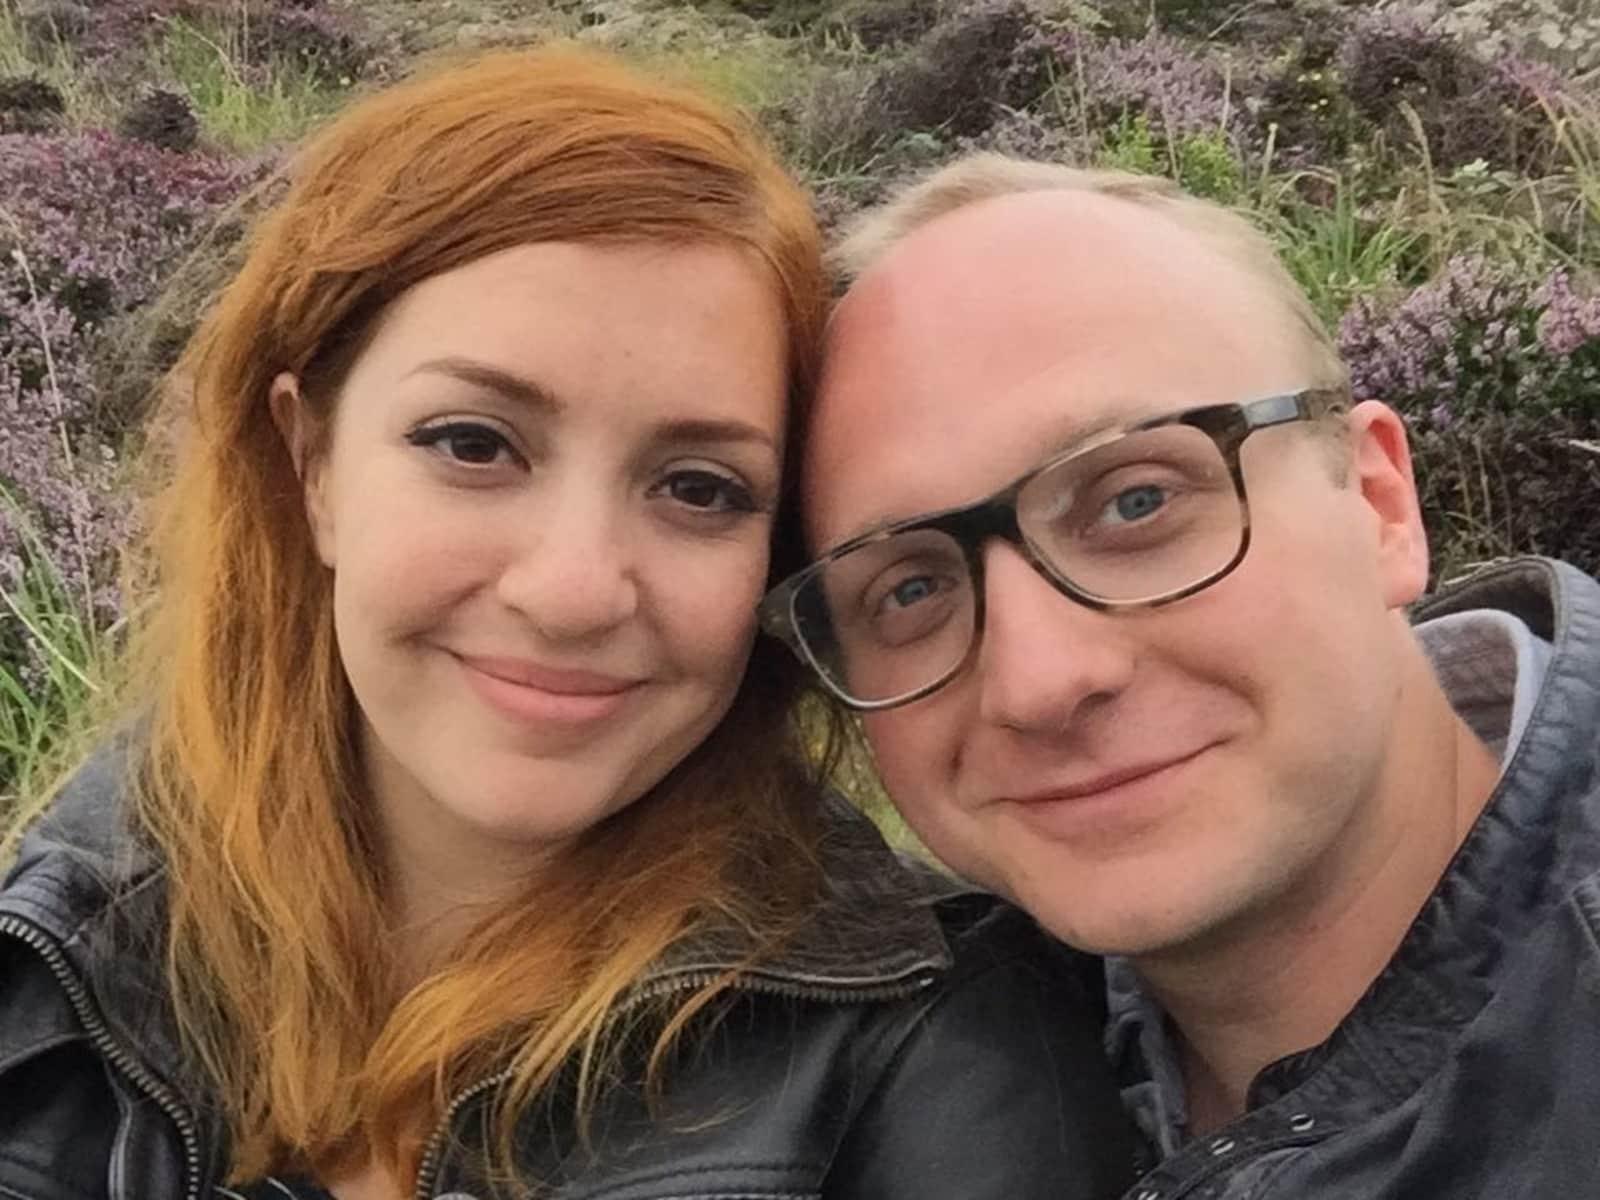 Henry & Natalie from London, United Kingdom